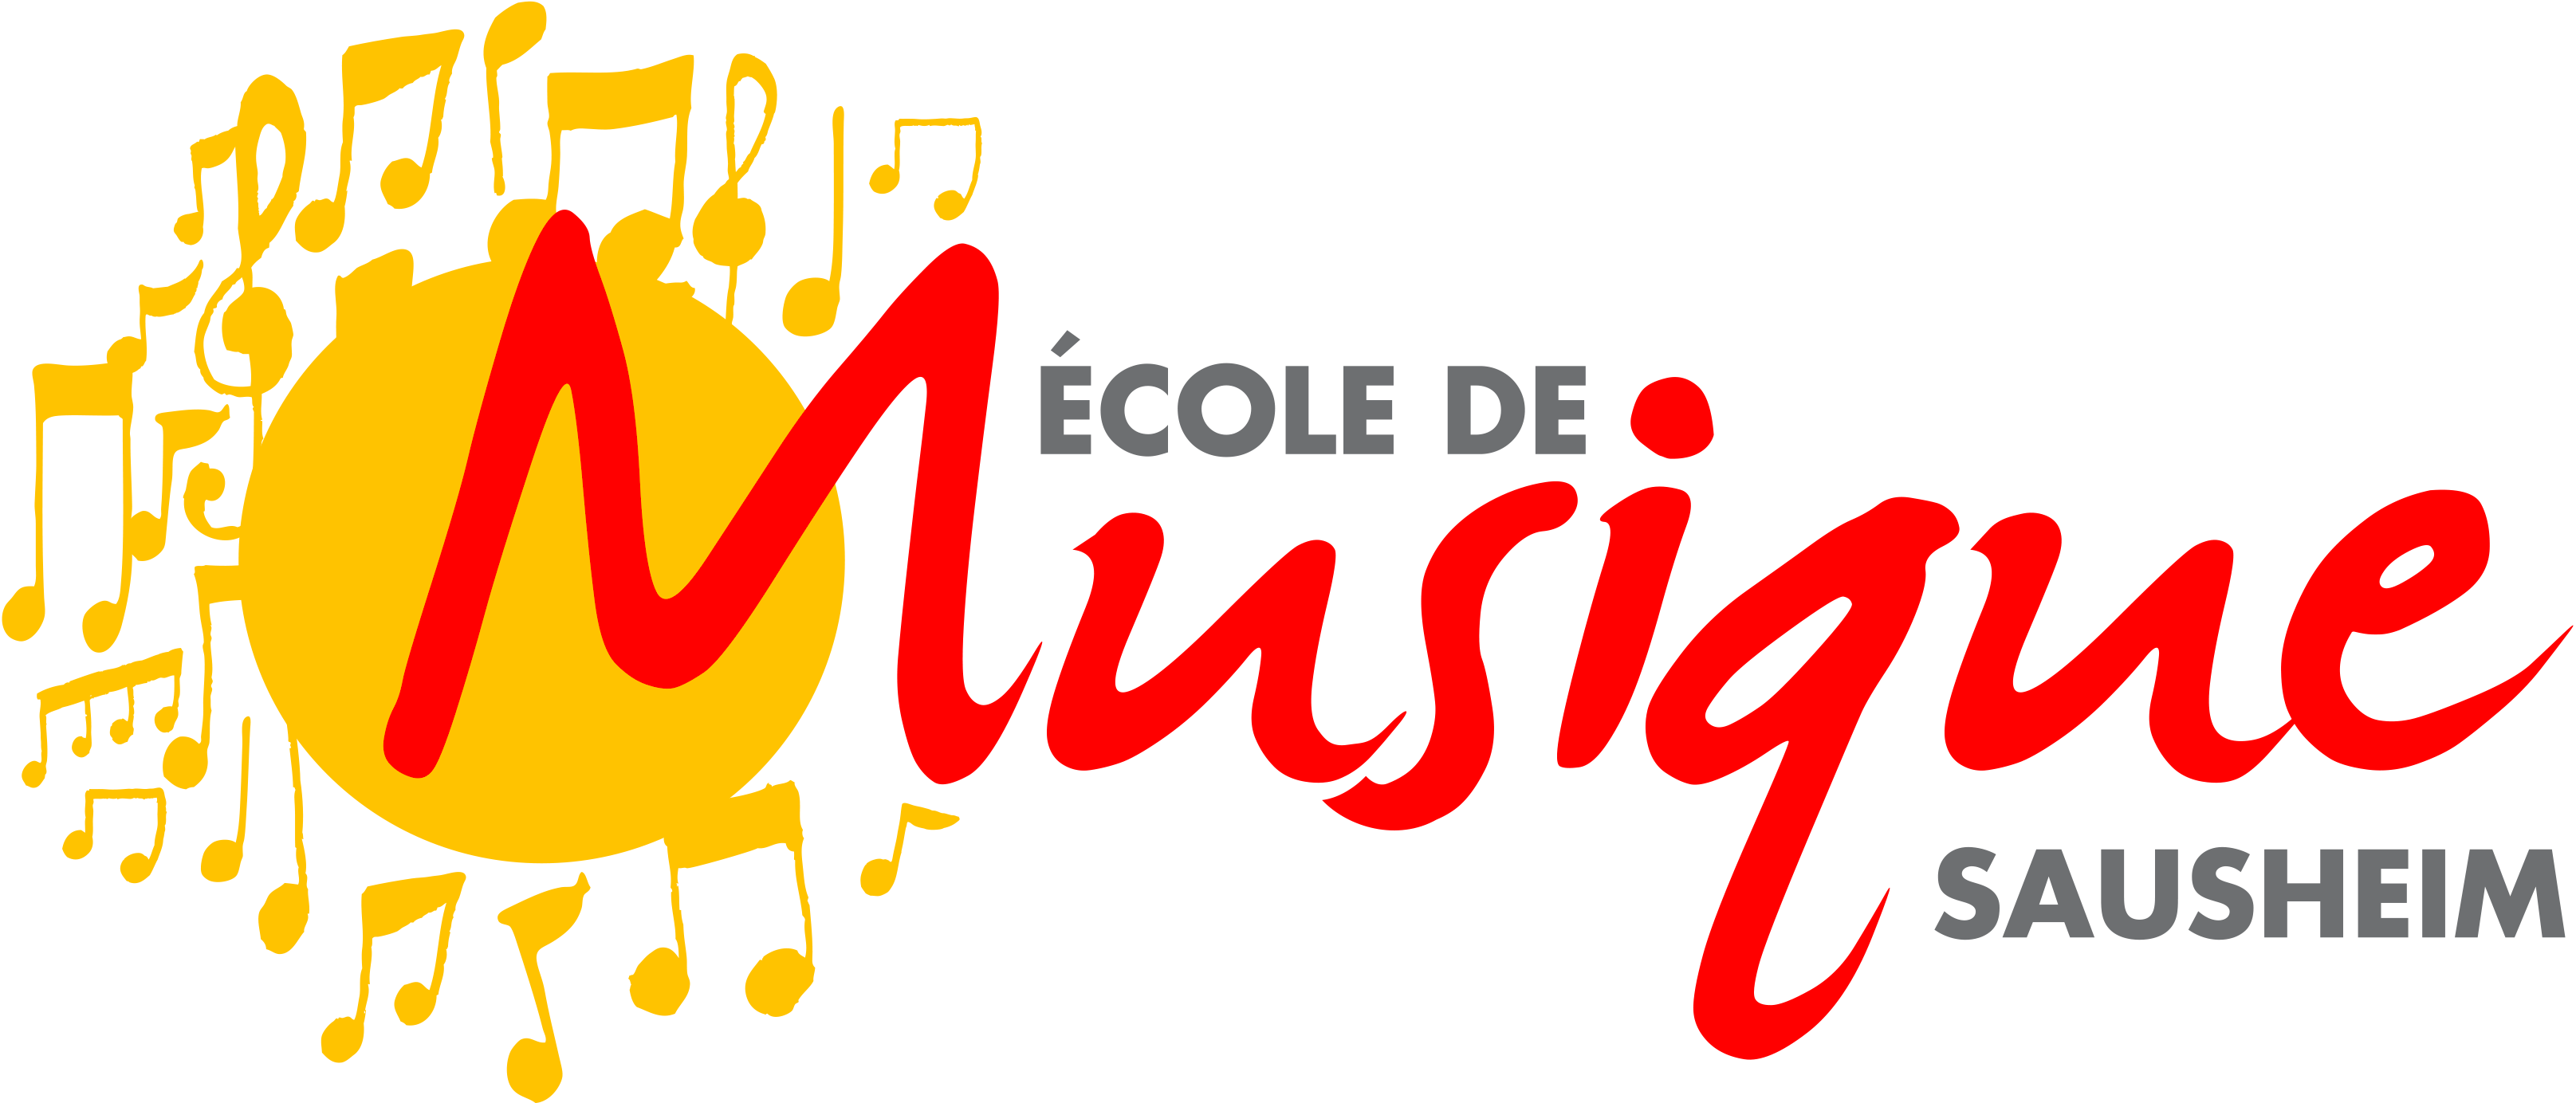 Logo Ecole de Musique Sausheim